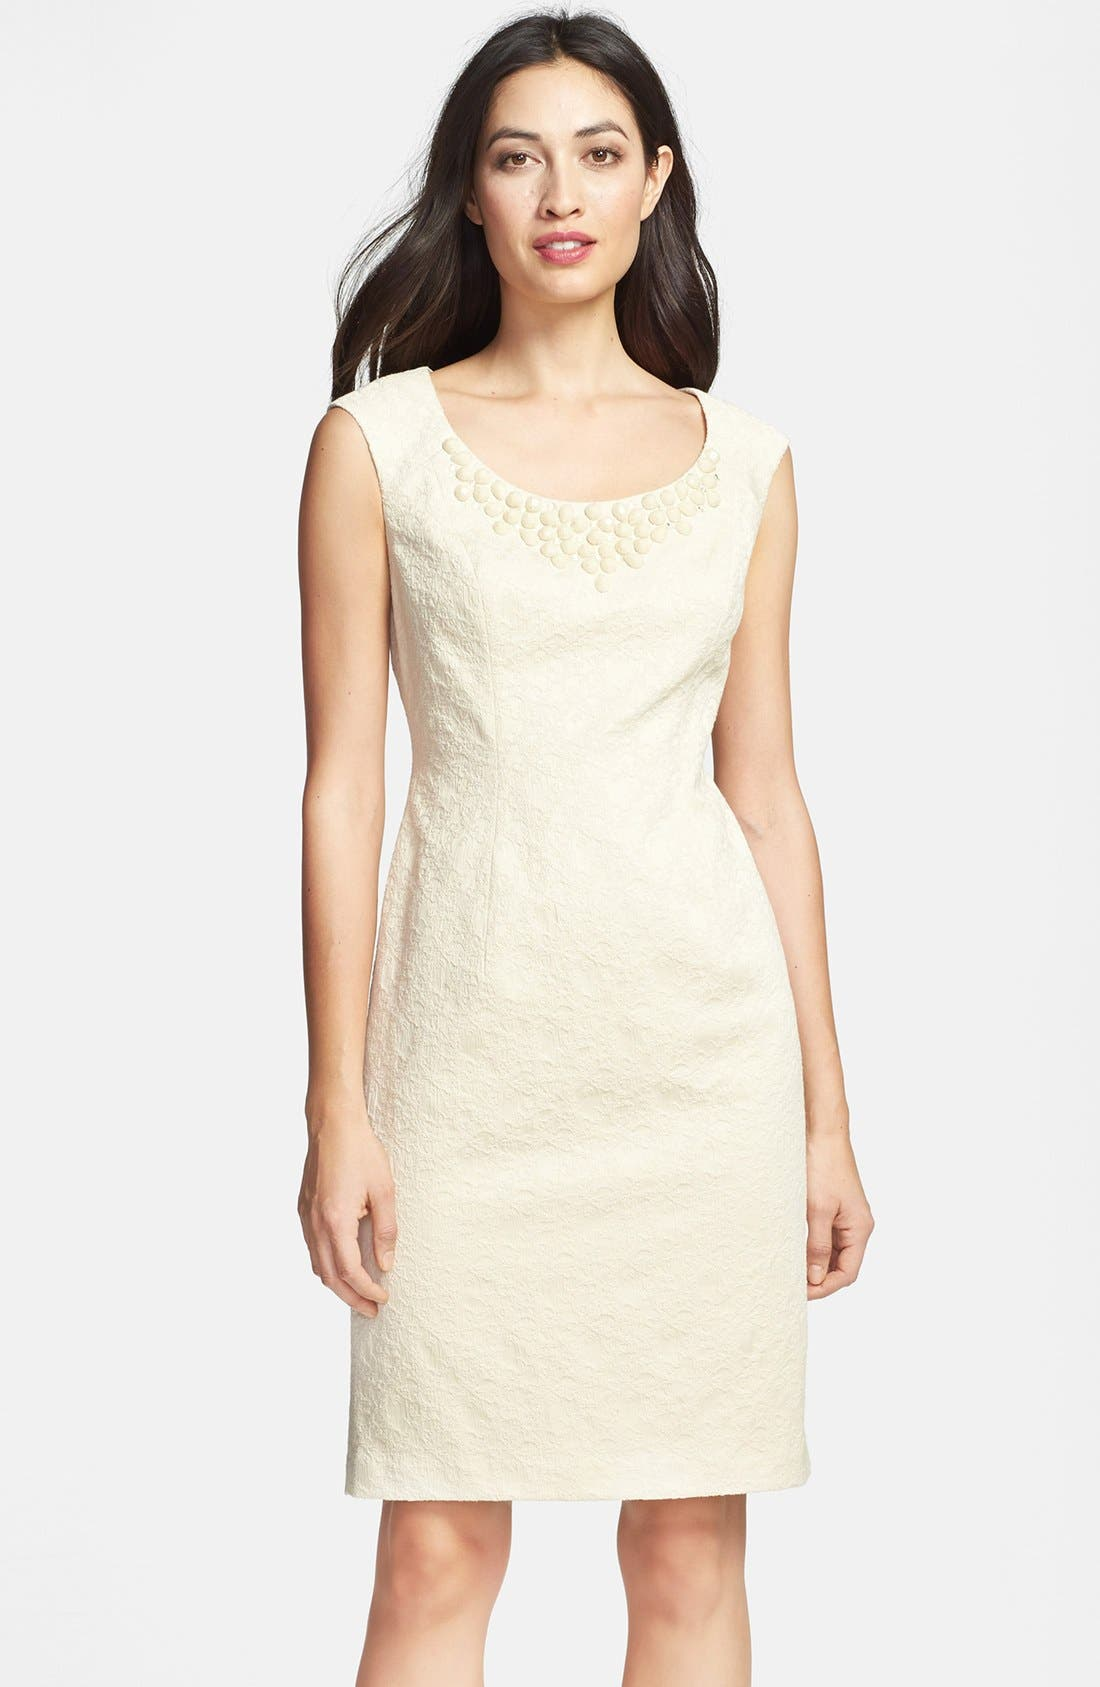 Alternate Image 1 Selected - Adrianna Papell Embellished Jacquard Sheath Dress